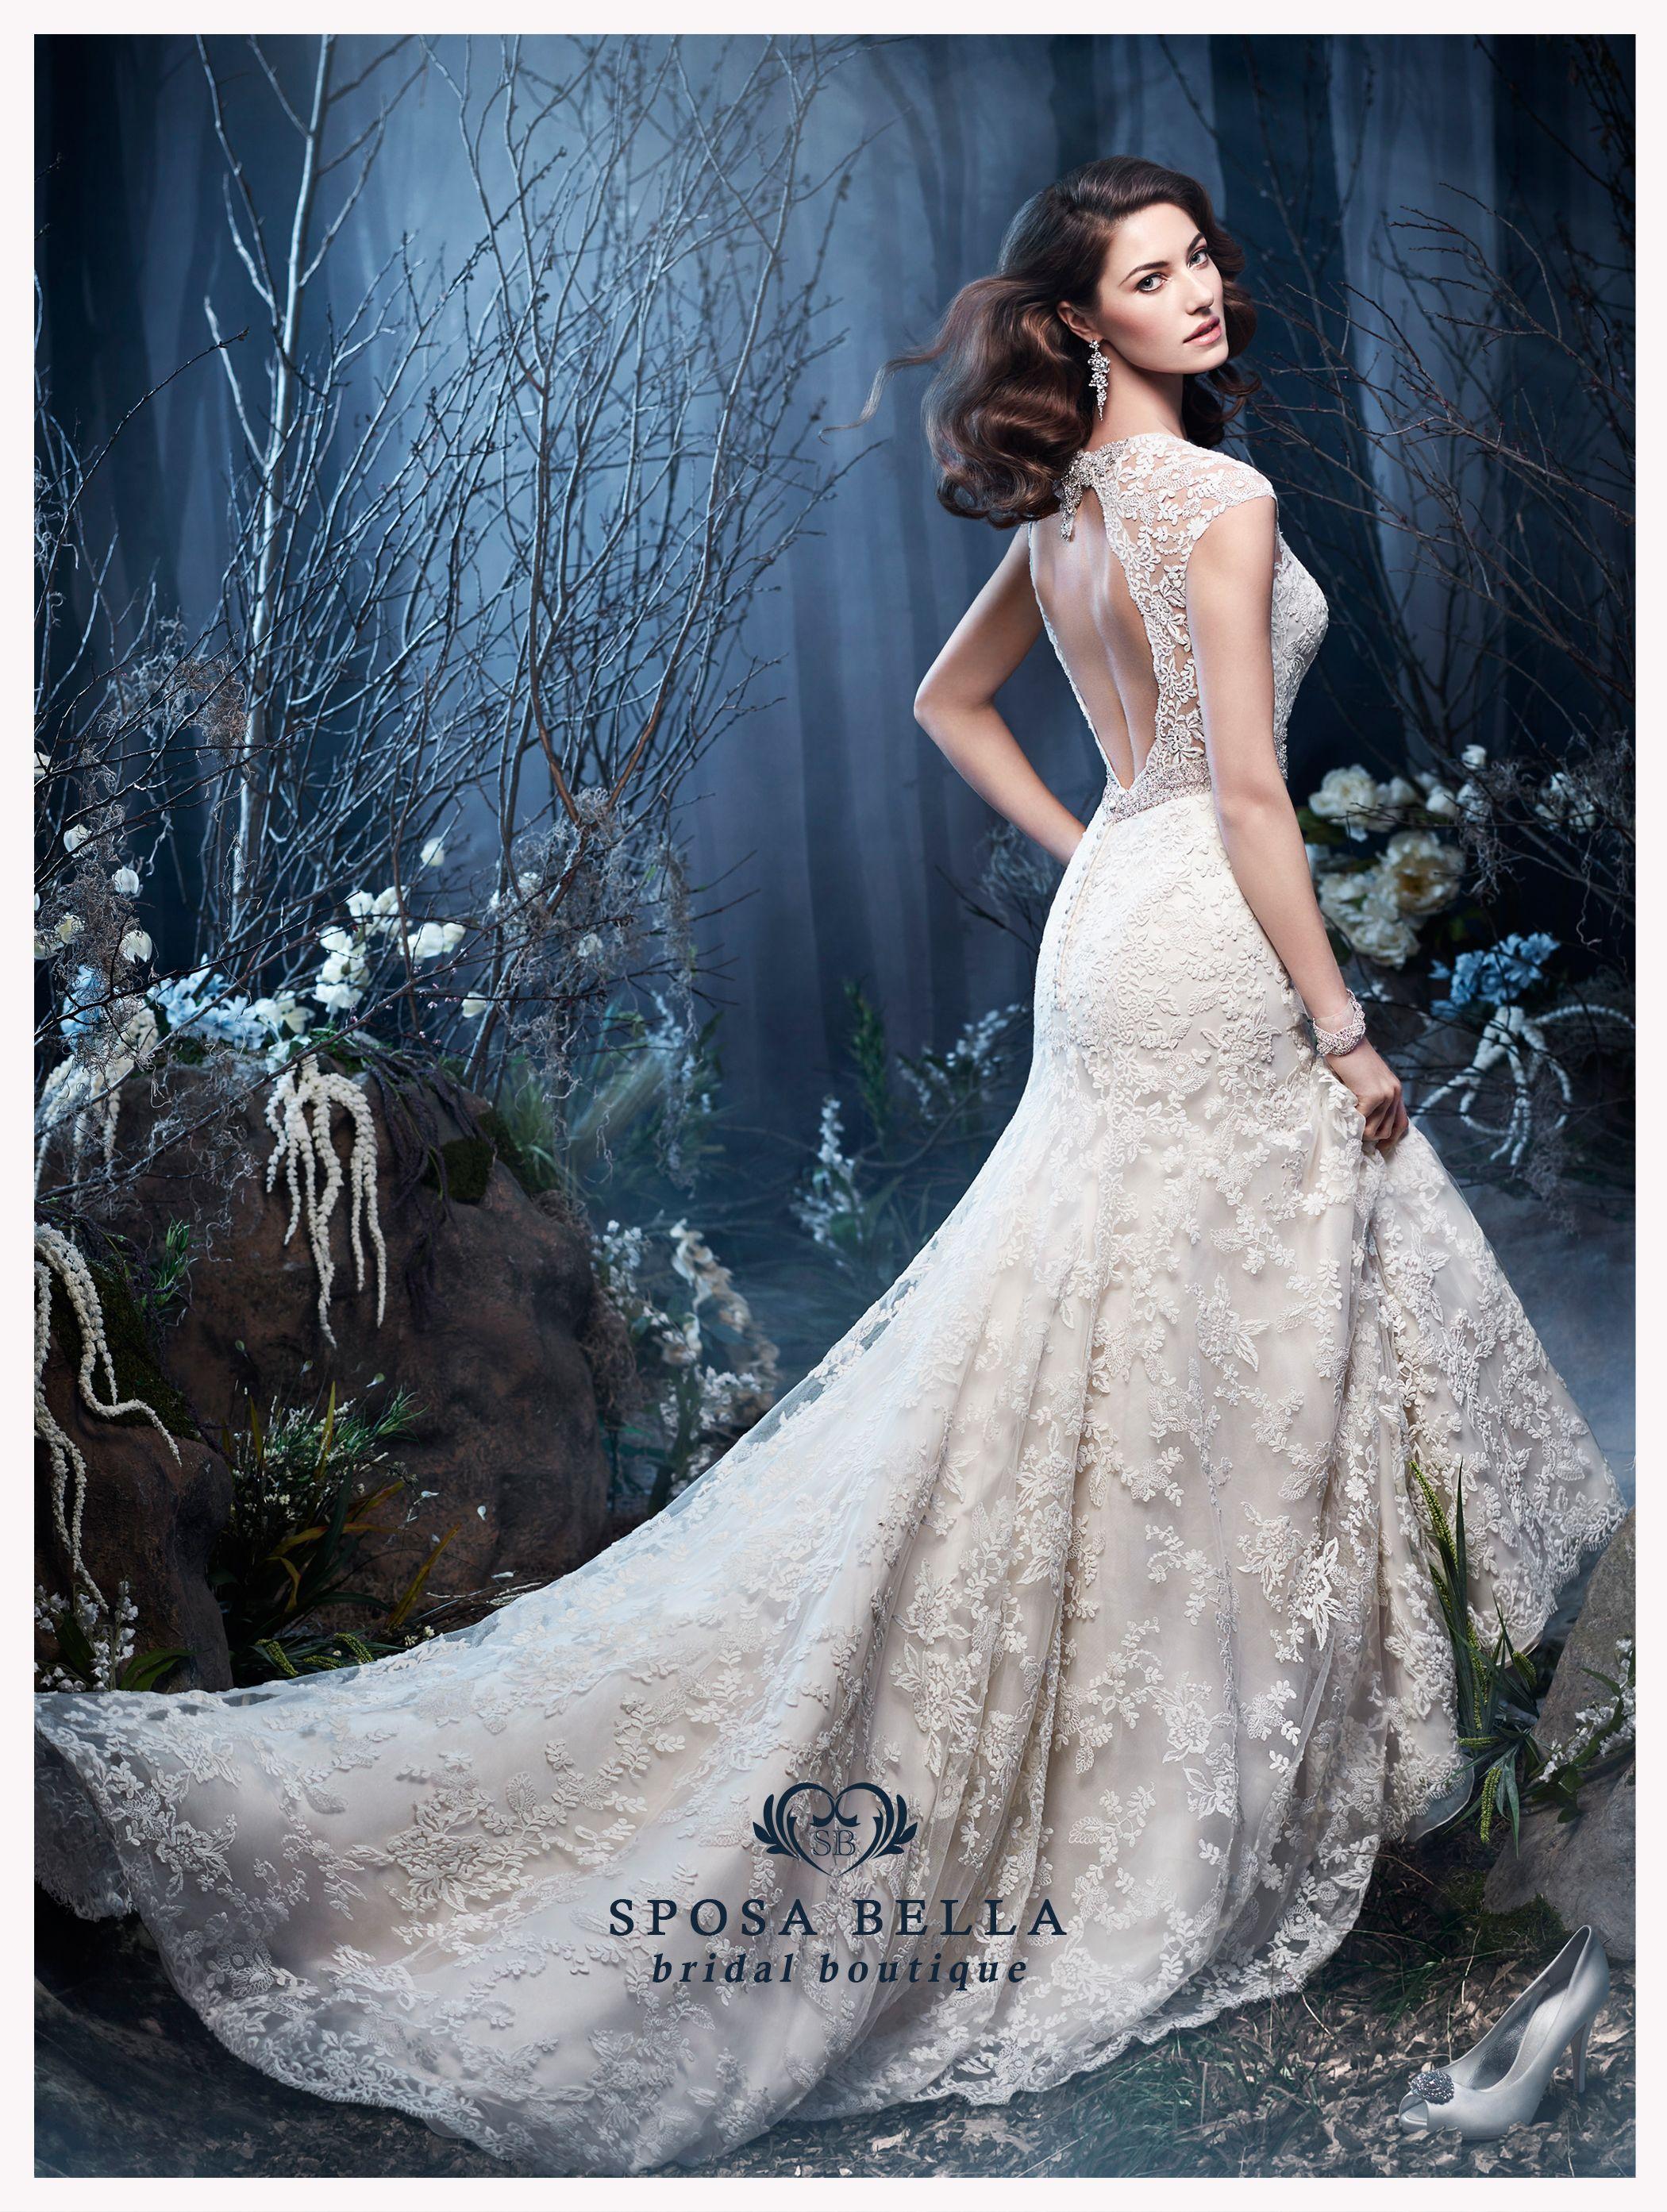 2e4602b5ad10 Pin by Sposa Bella Bridal Boutique on Sposa Bella Bridal   Bridesmaids